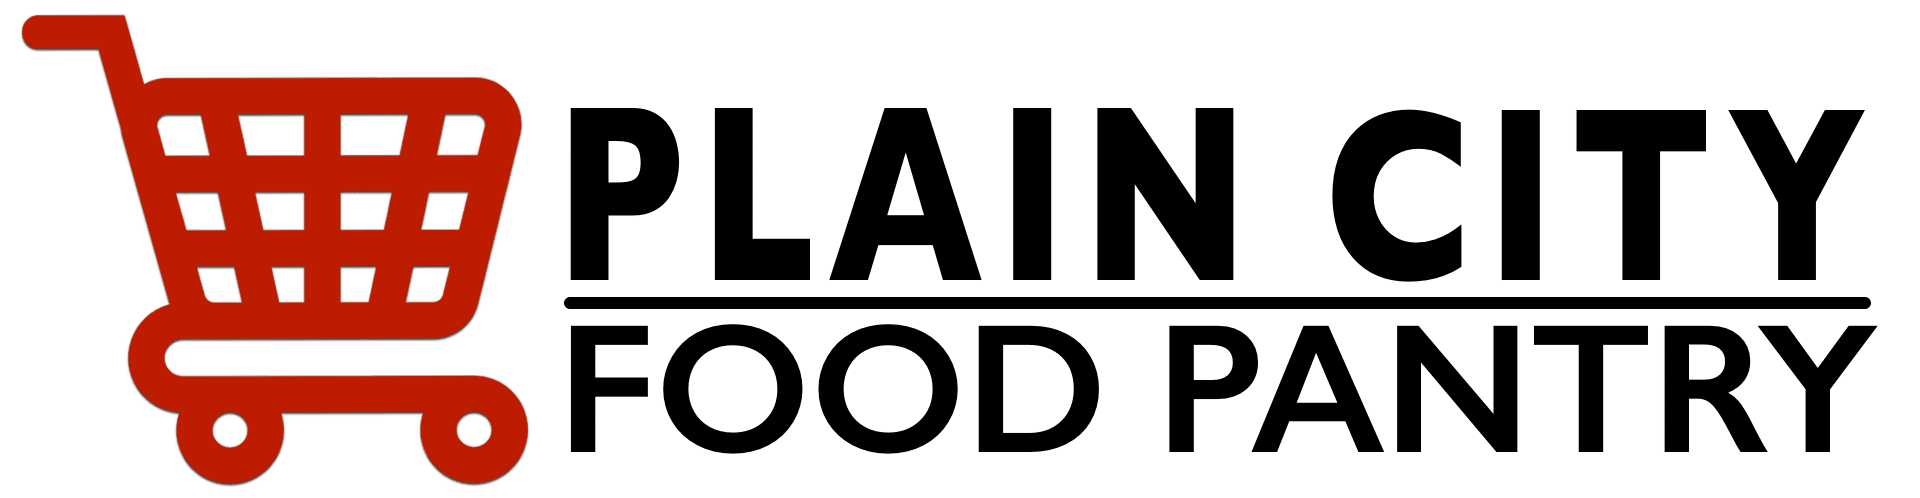 Plain City Food Pantry